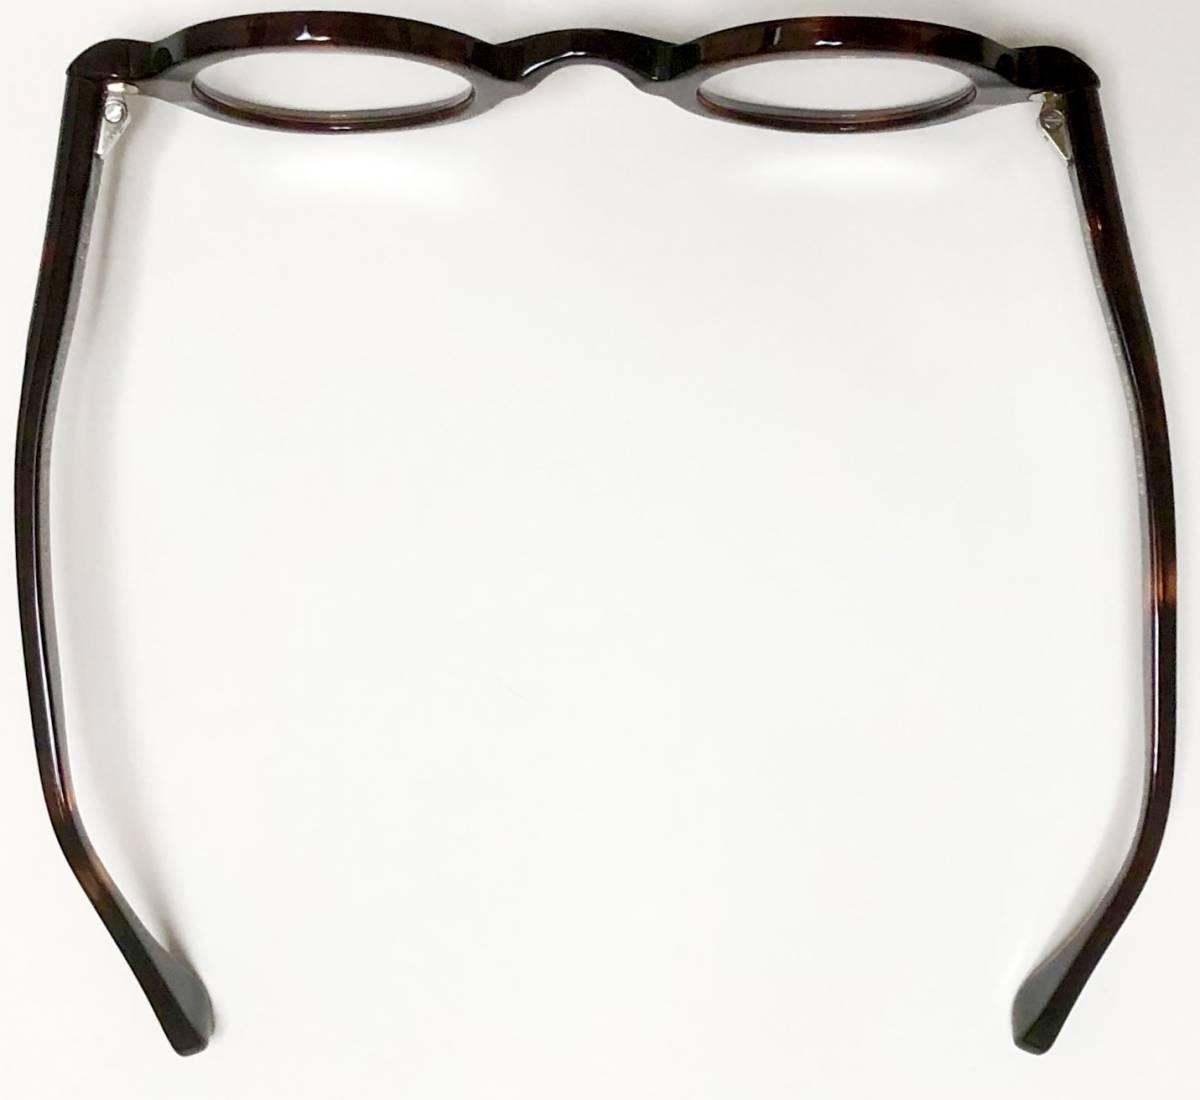 Vue dc. 新品未開封】極太 フレームフランス製 Frame France 一山式 丸メガネ 純正ケース付き ヴュードゥシー_画像8